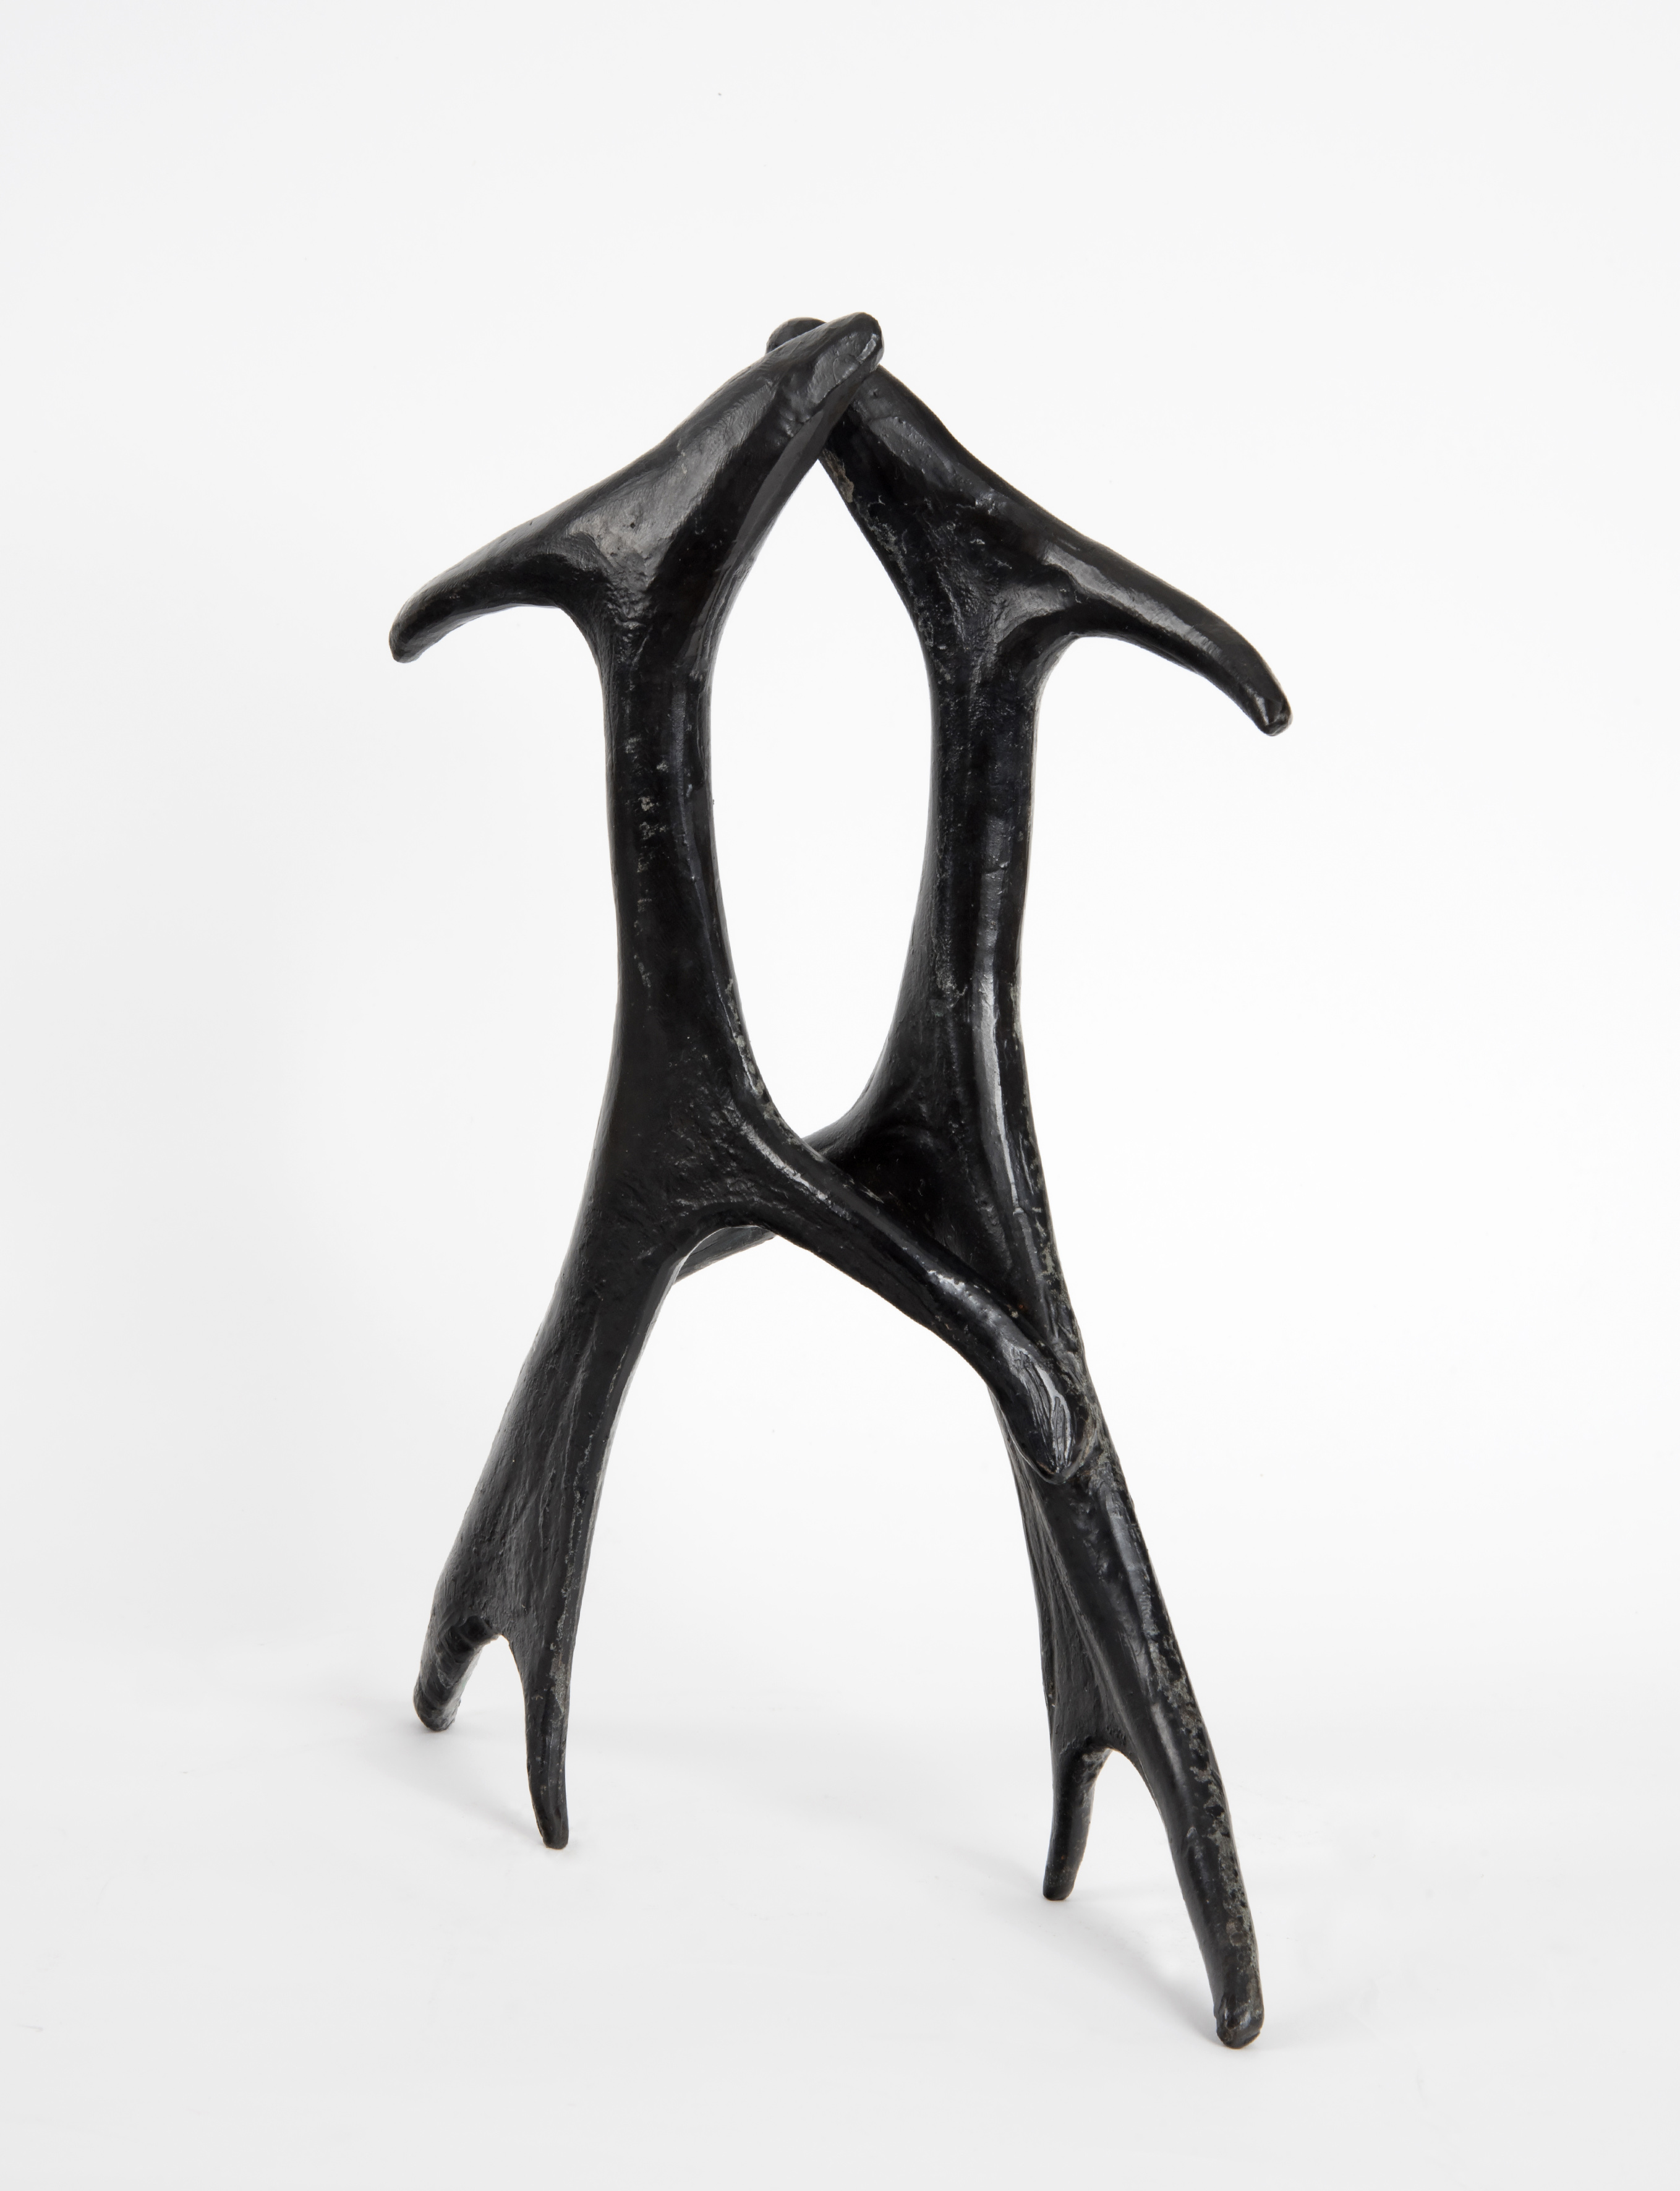 Lovers_Beatrice Magalotti_28x25x10cm_Bronze